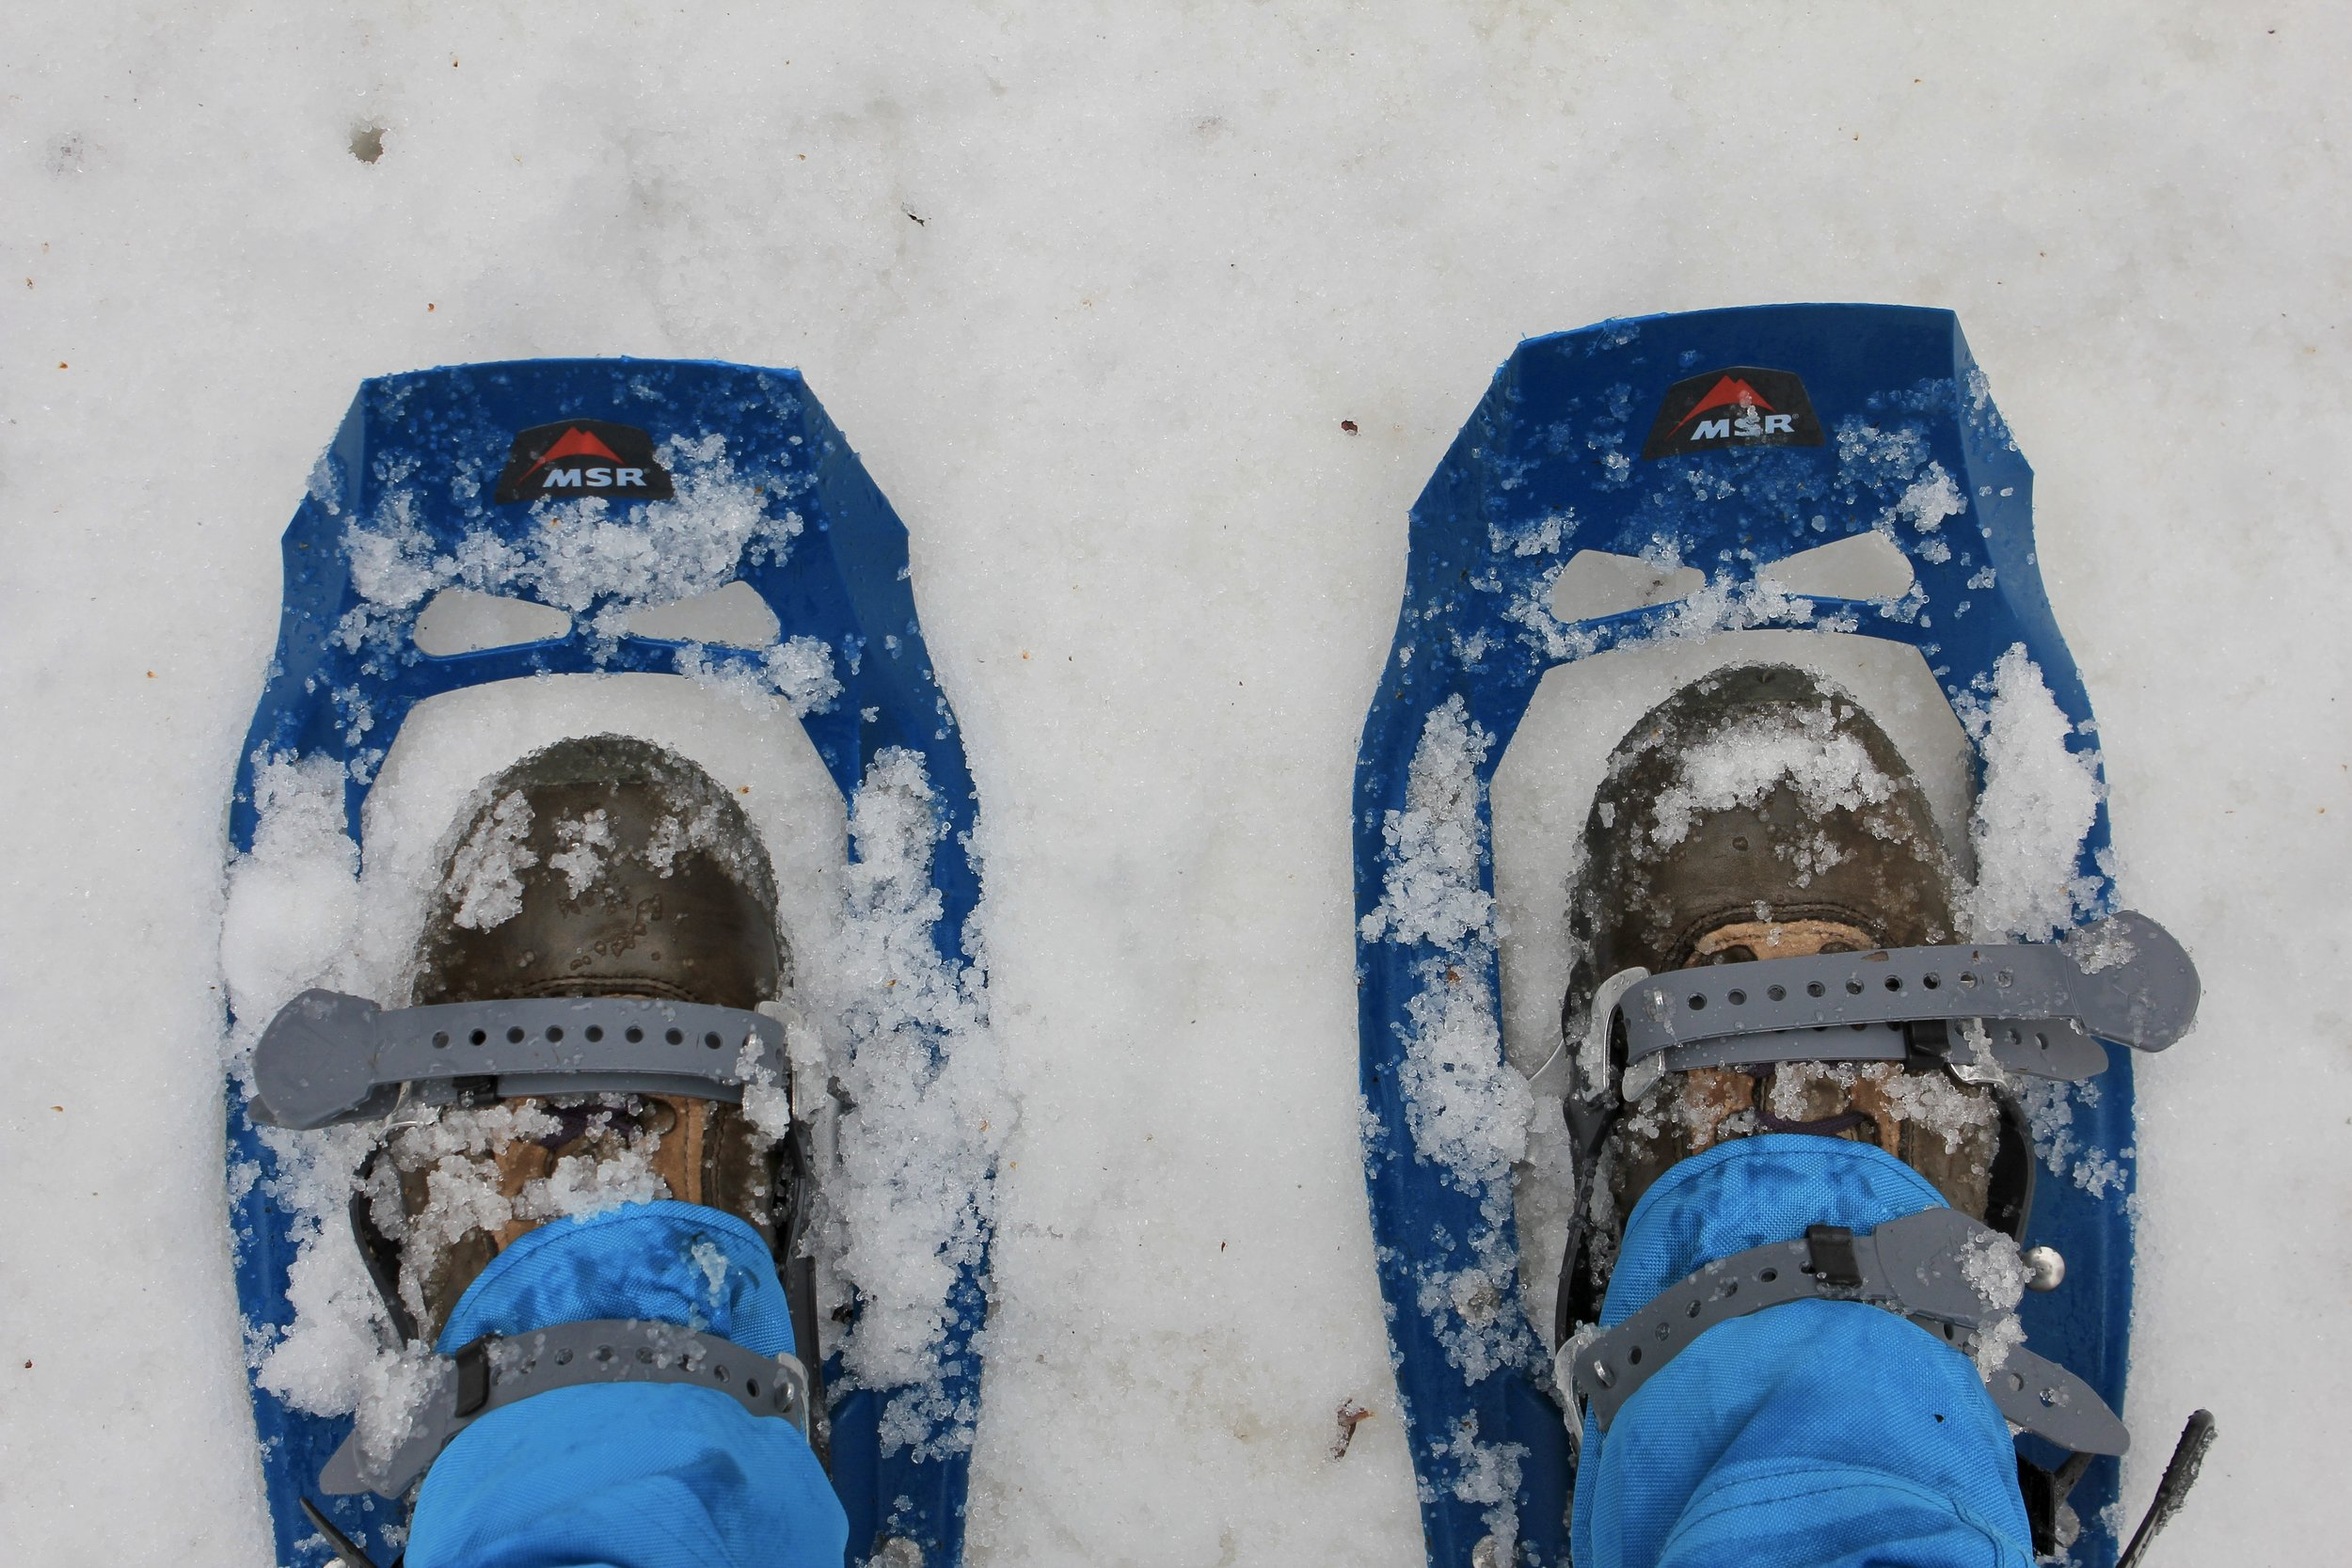 msr evo snowshoes.jpg